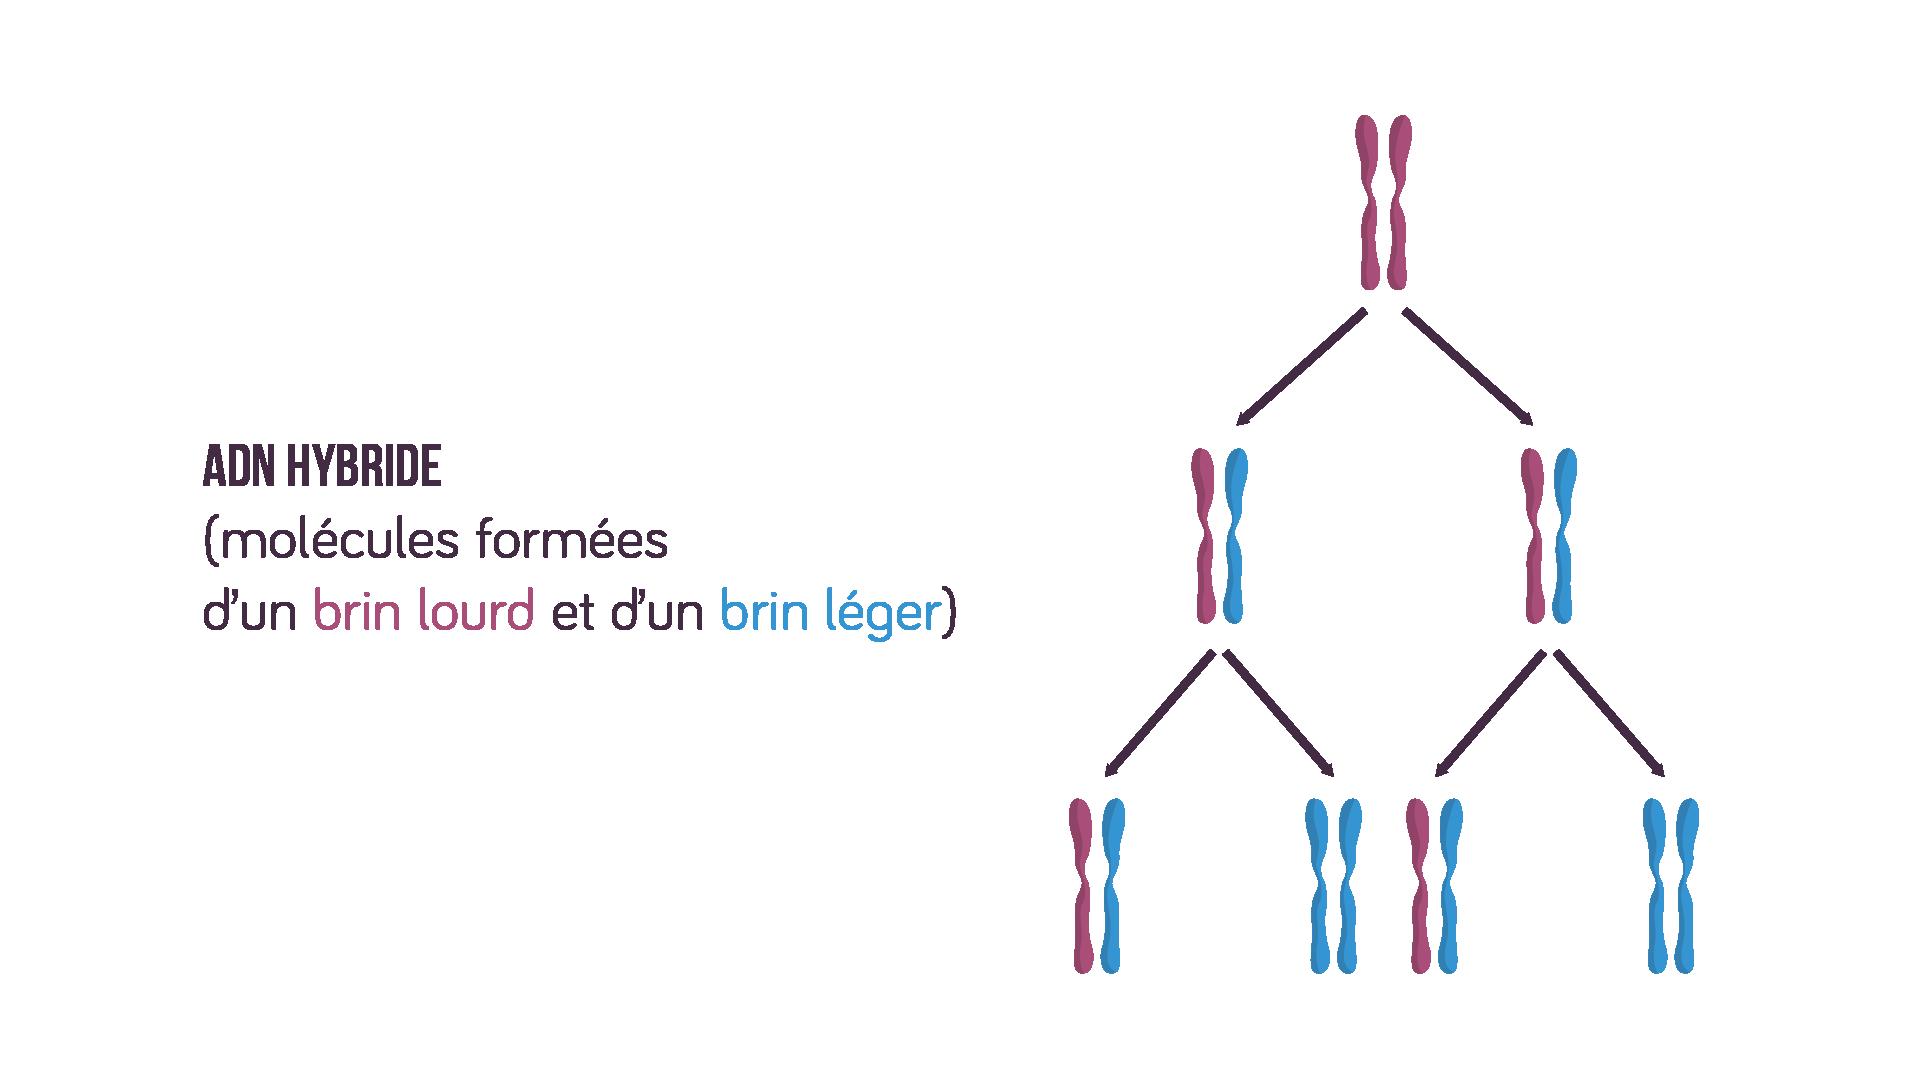 Molécules d'ADN hybride avec réplication semi-conservative